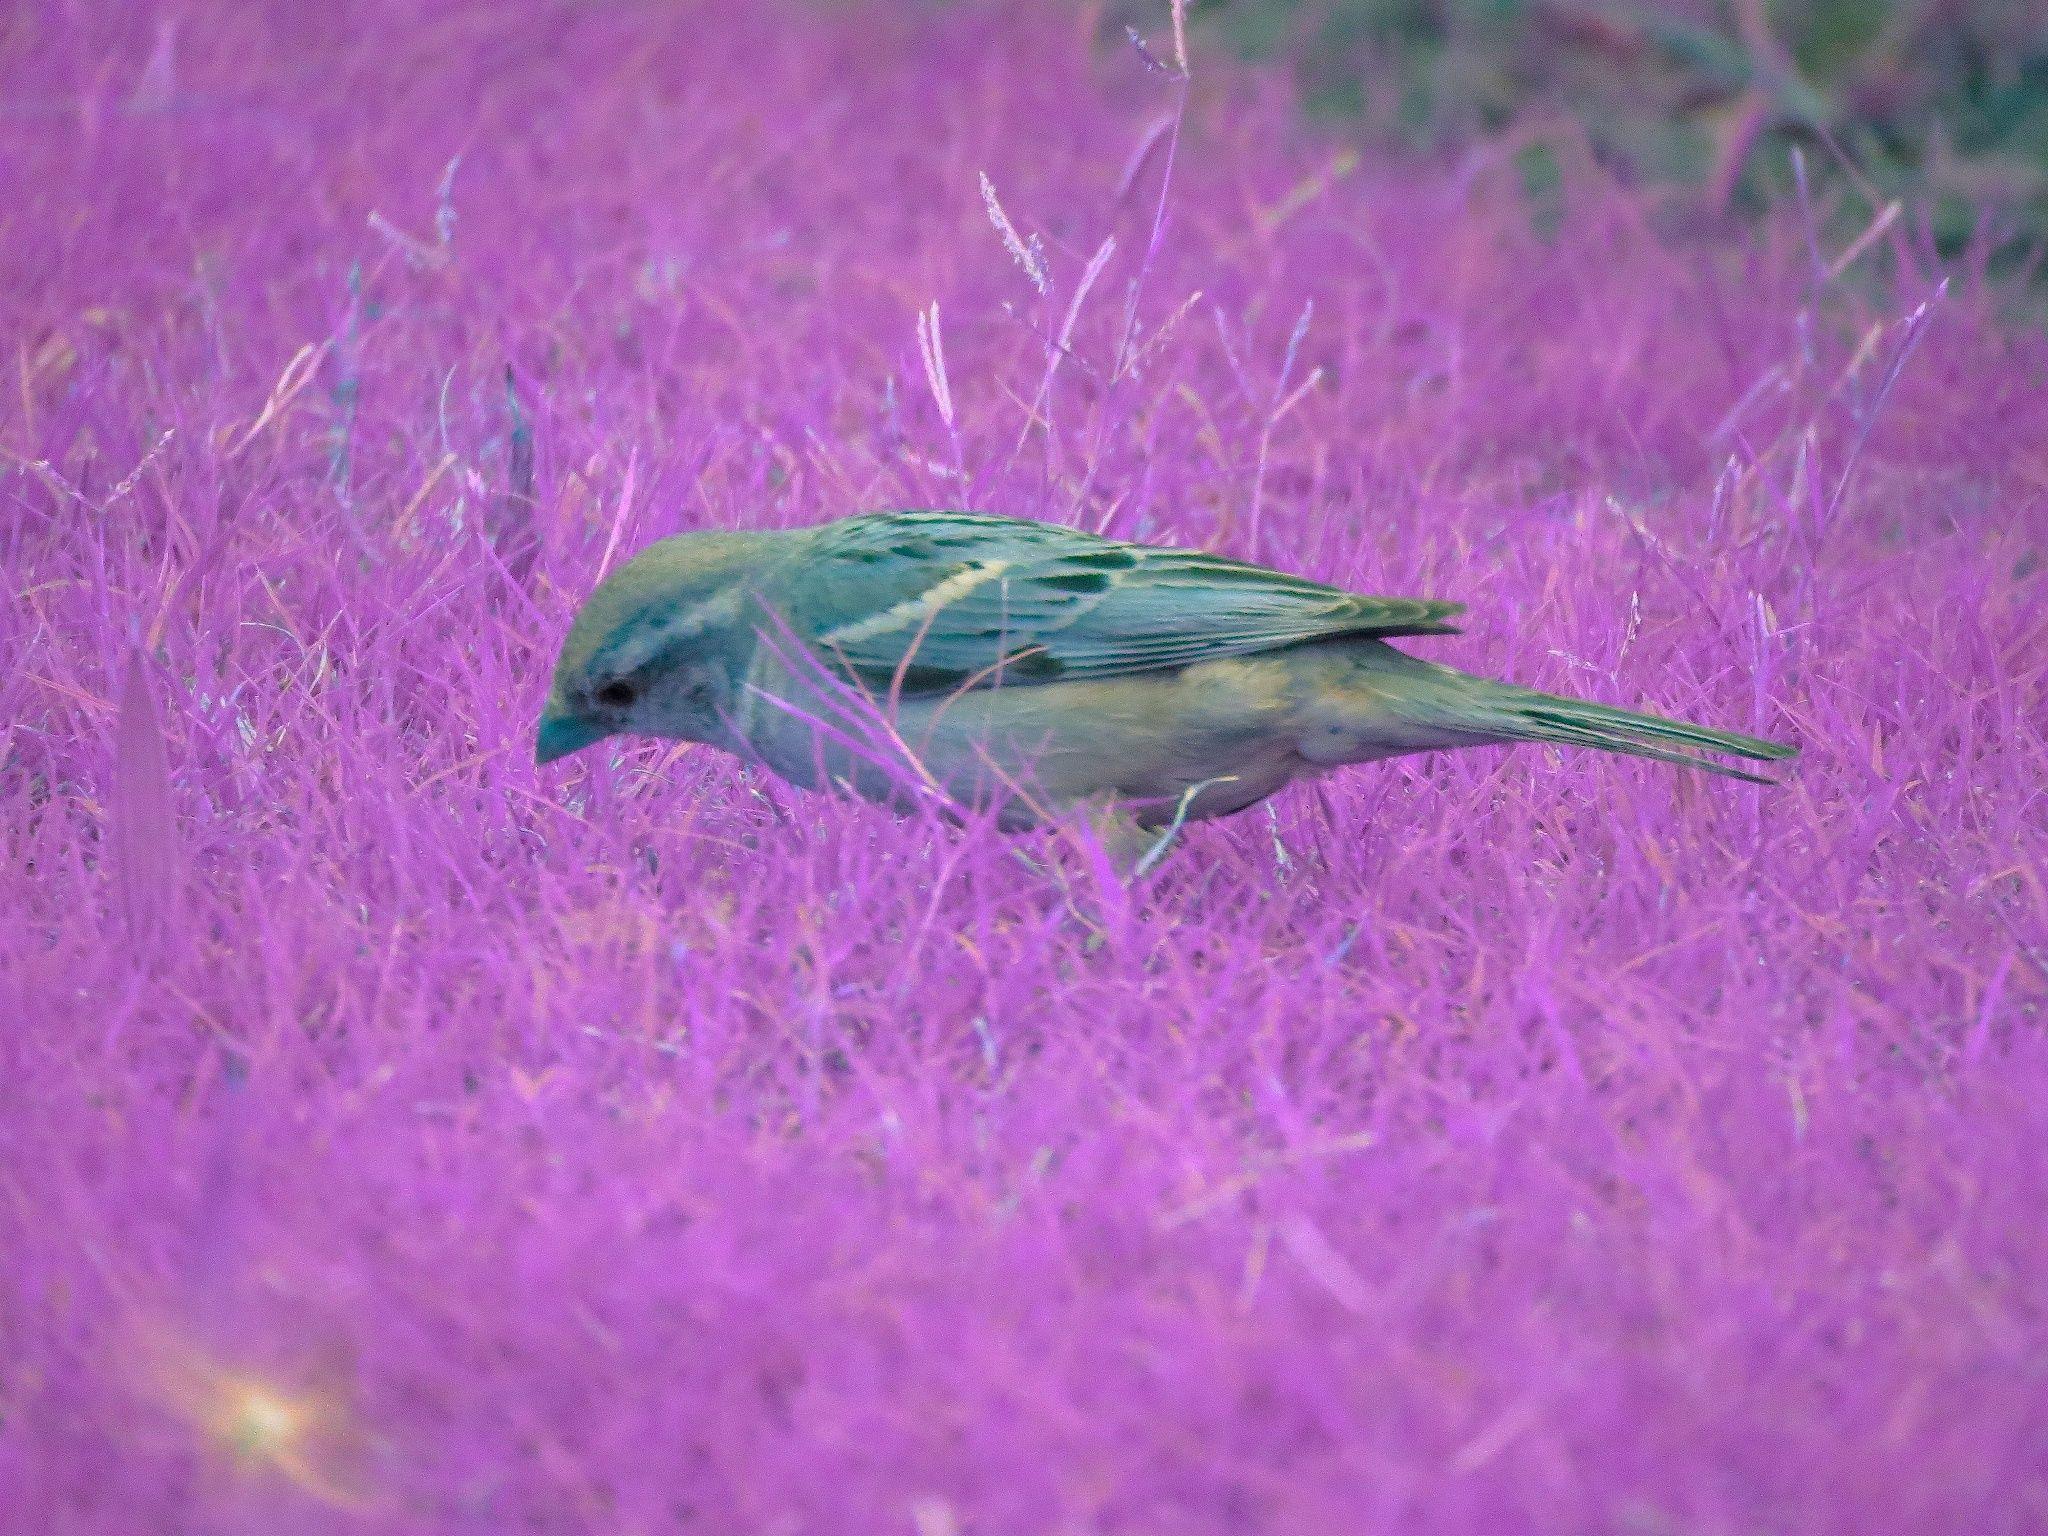 Little birdie in a magical garden by fatima mehdi on 500px